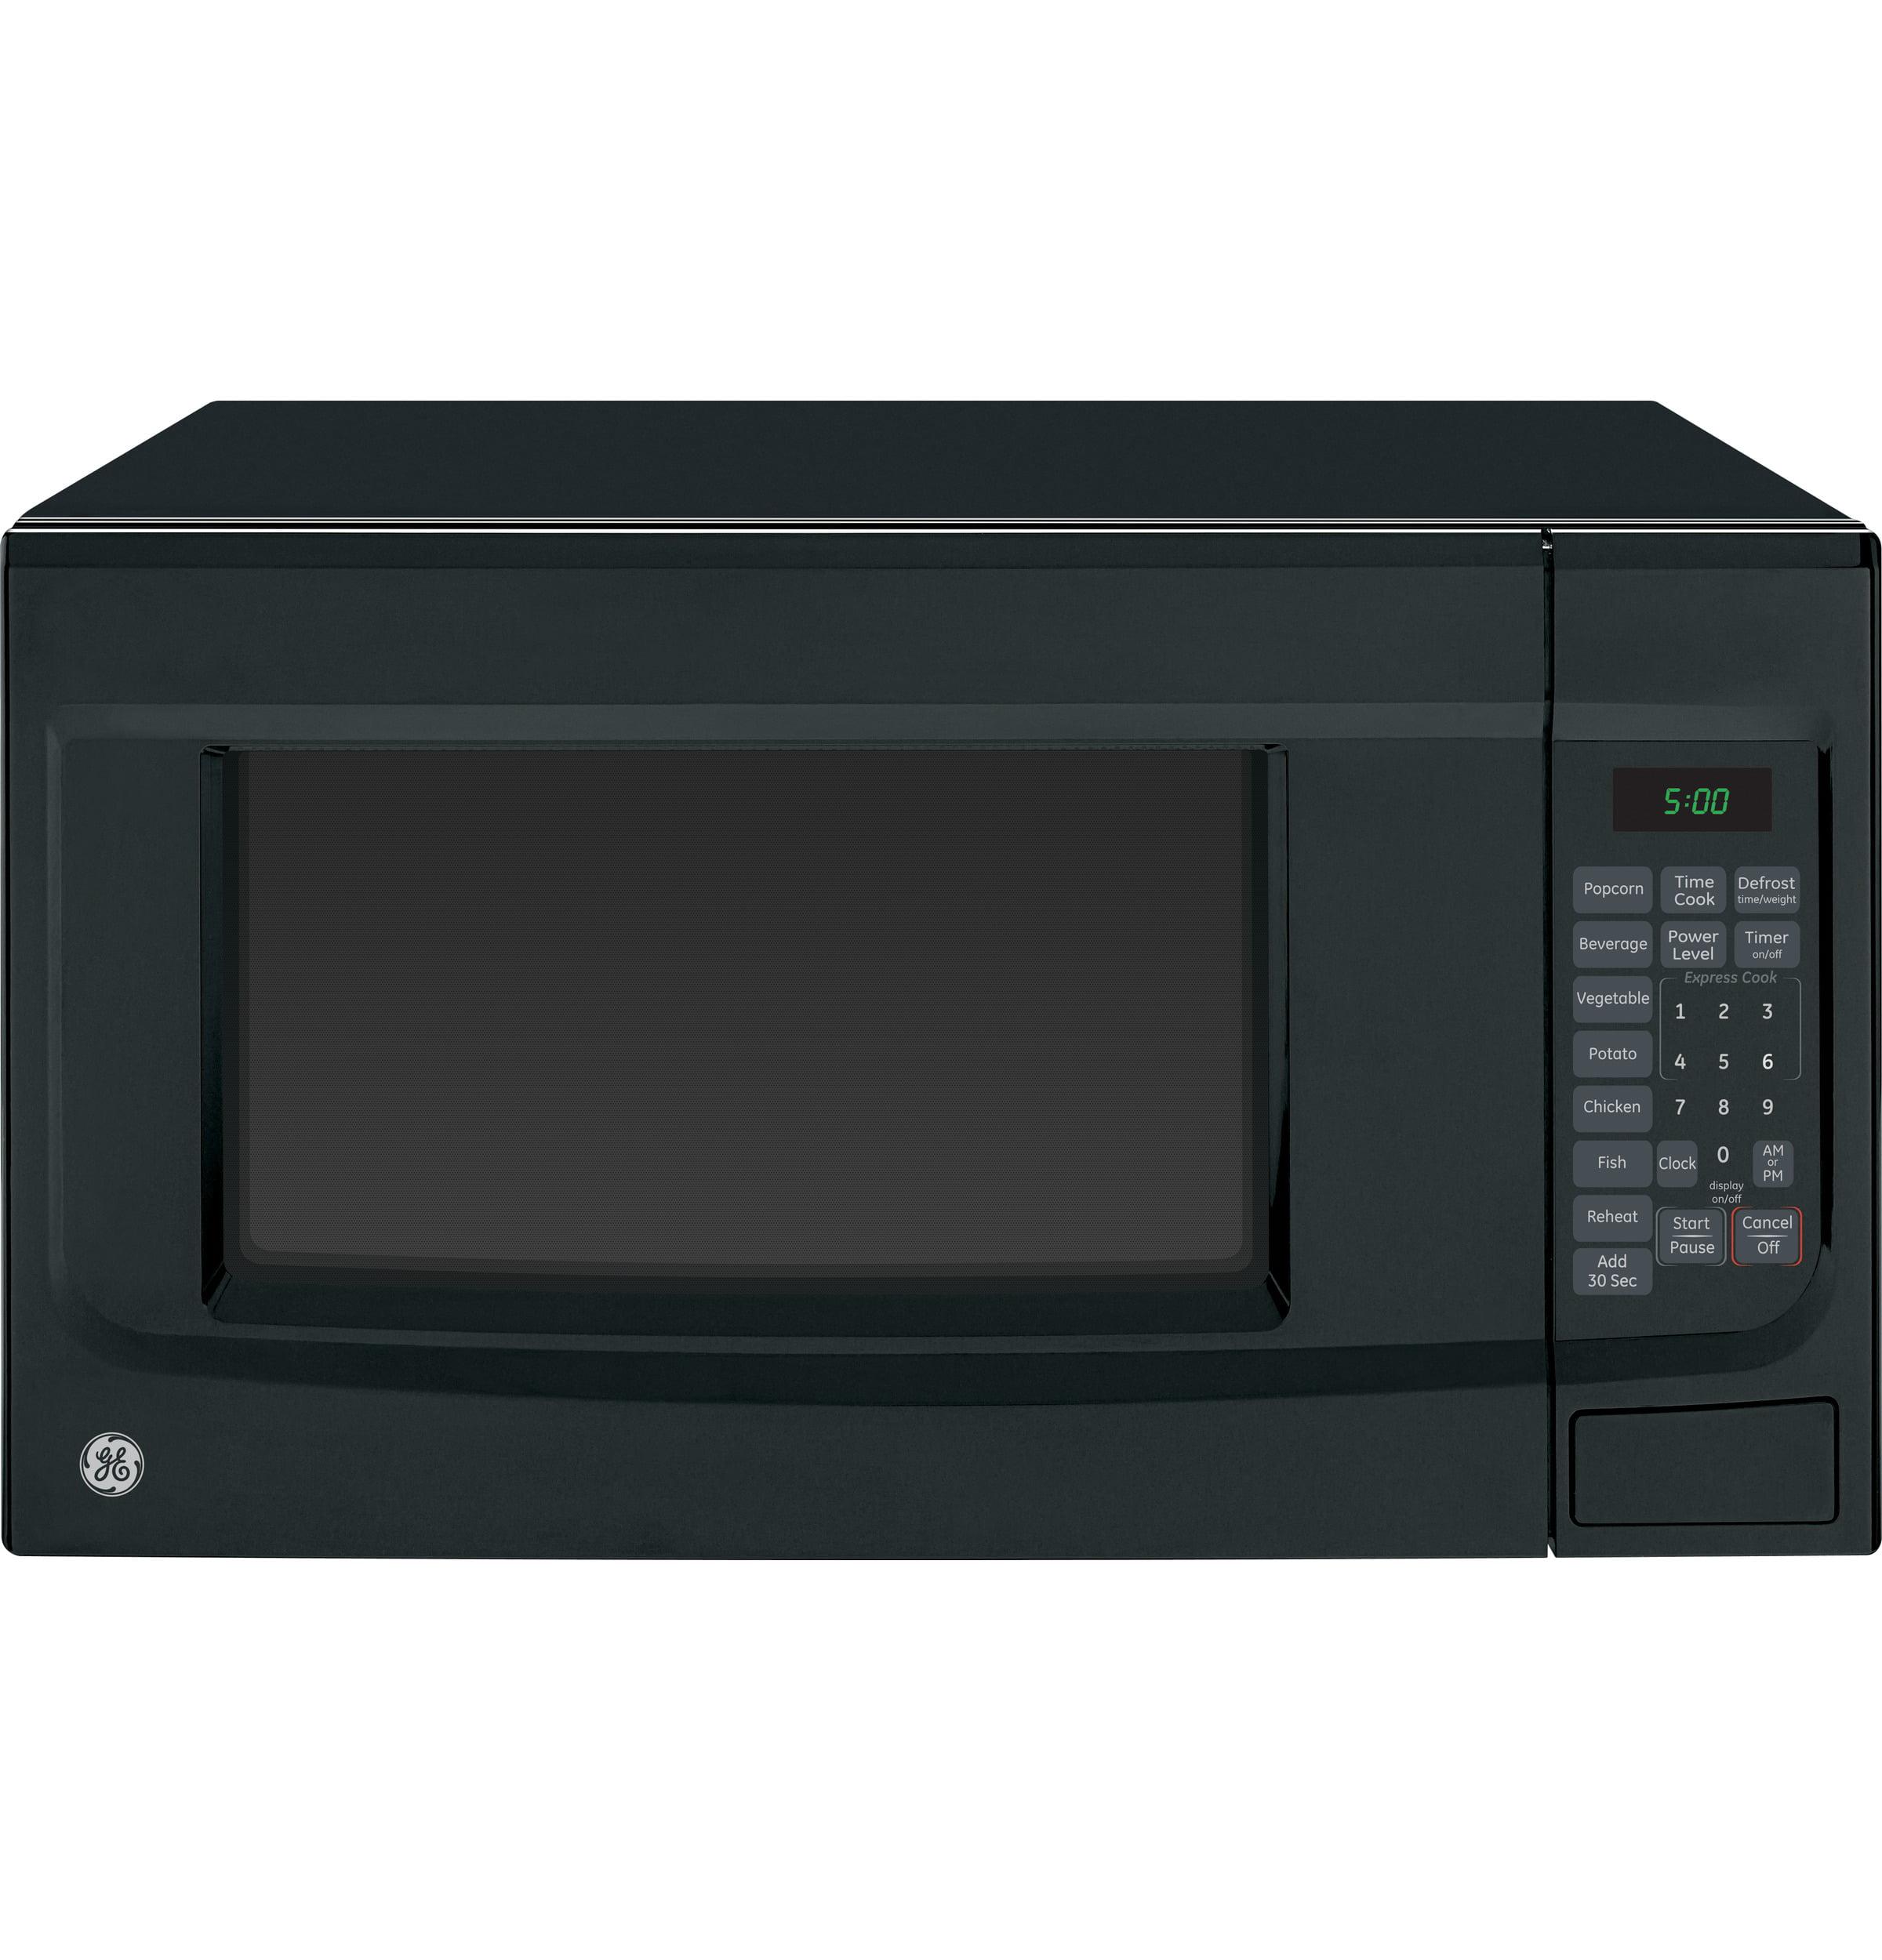 GE 1.4 cu ft Countertop Microwave Oven